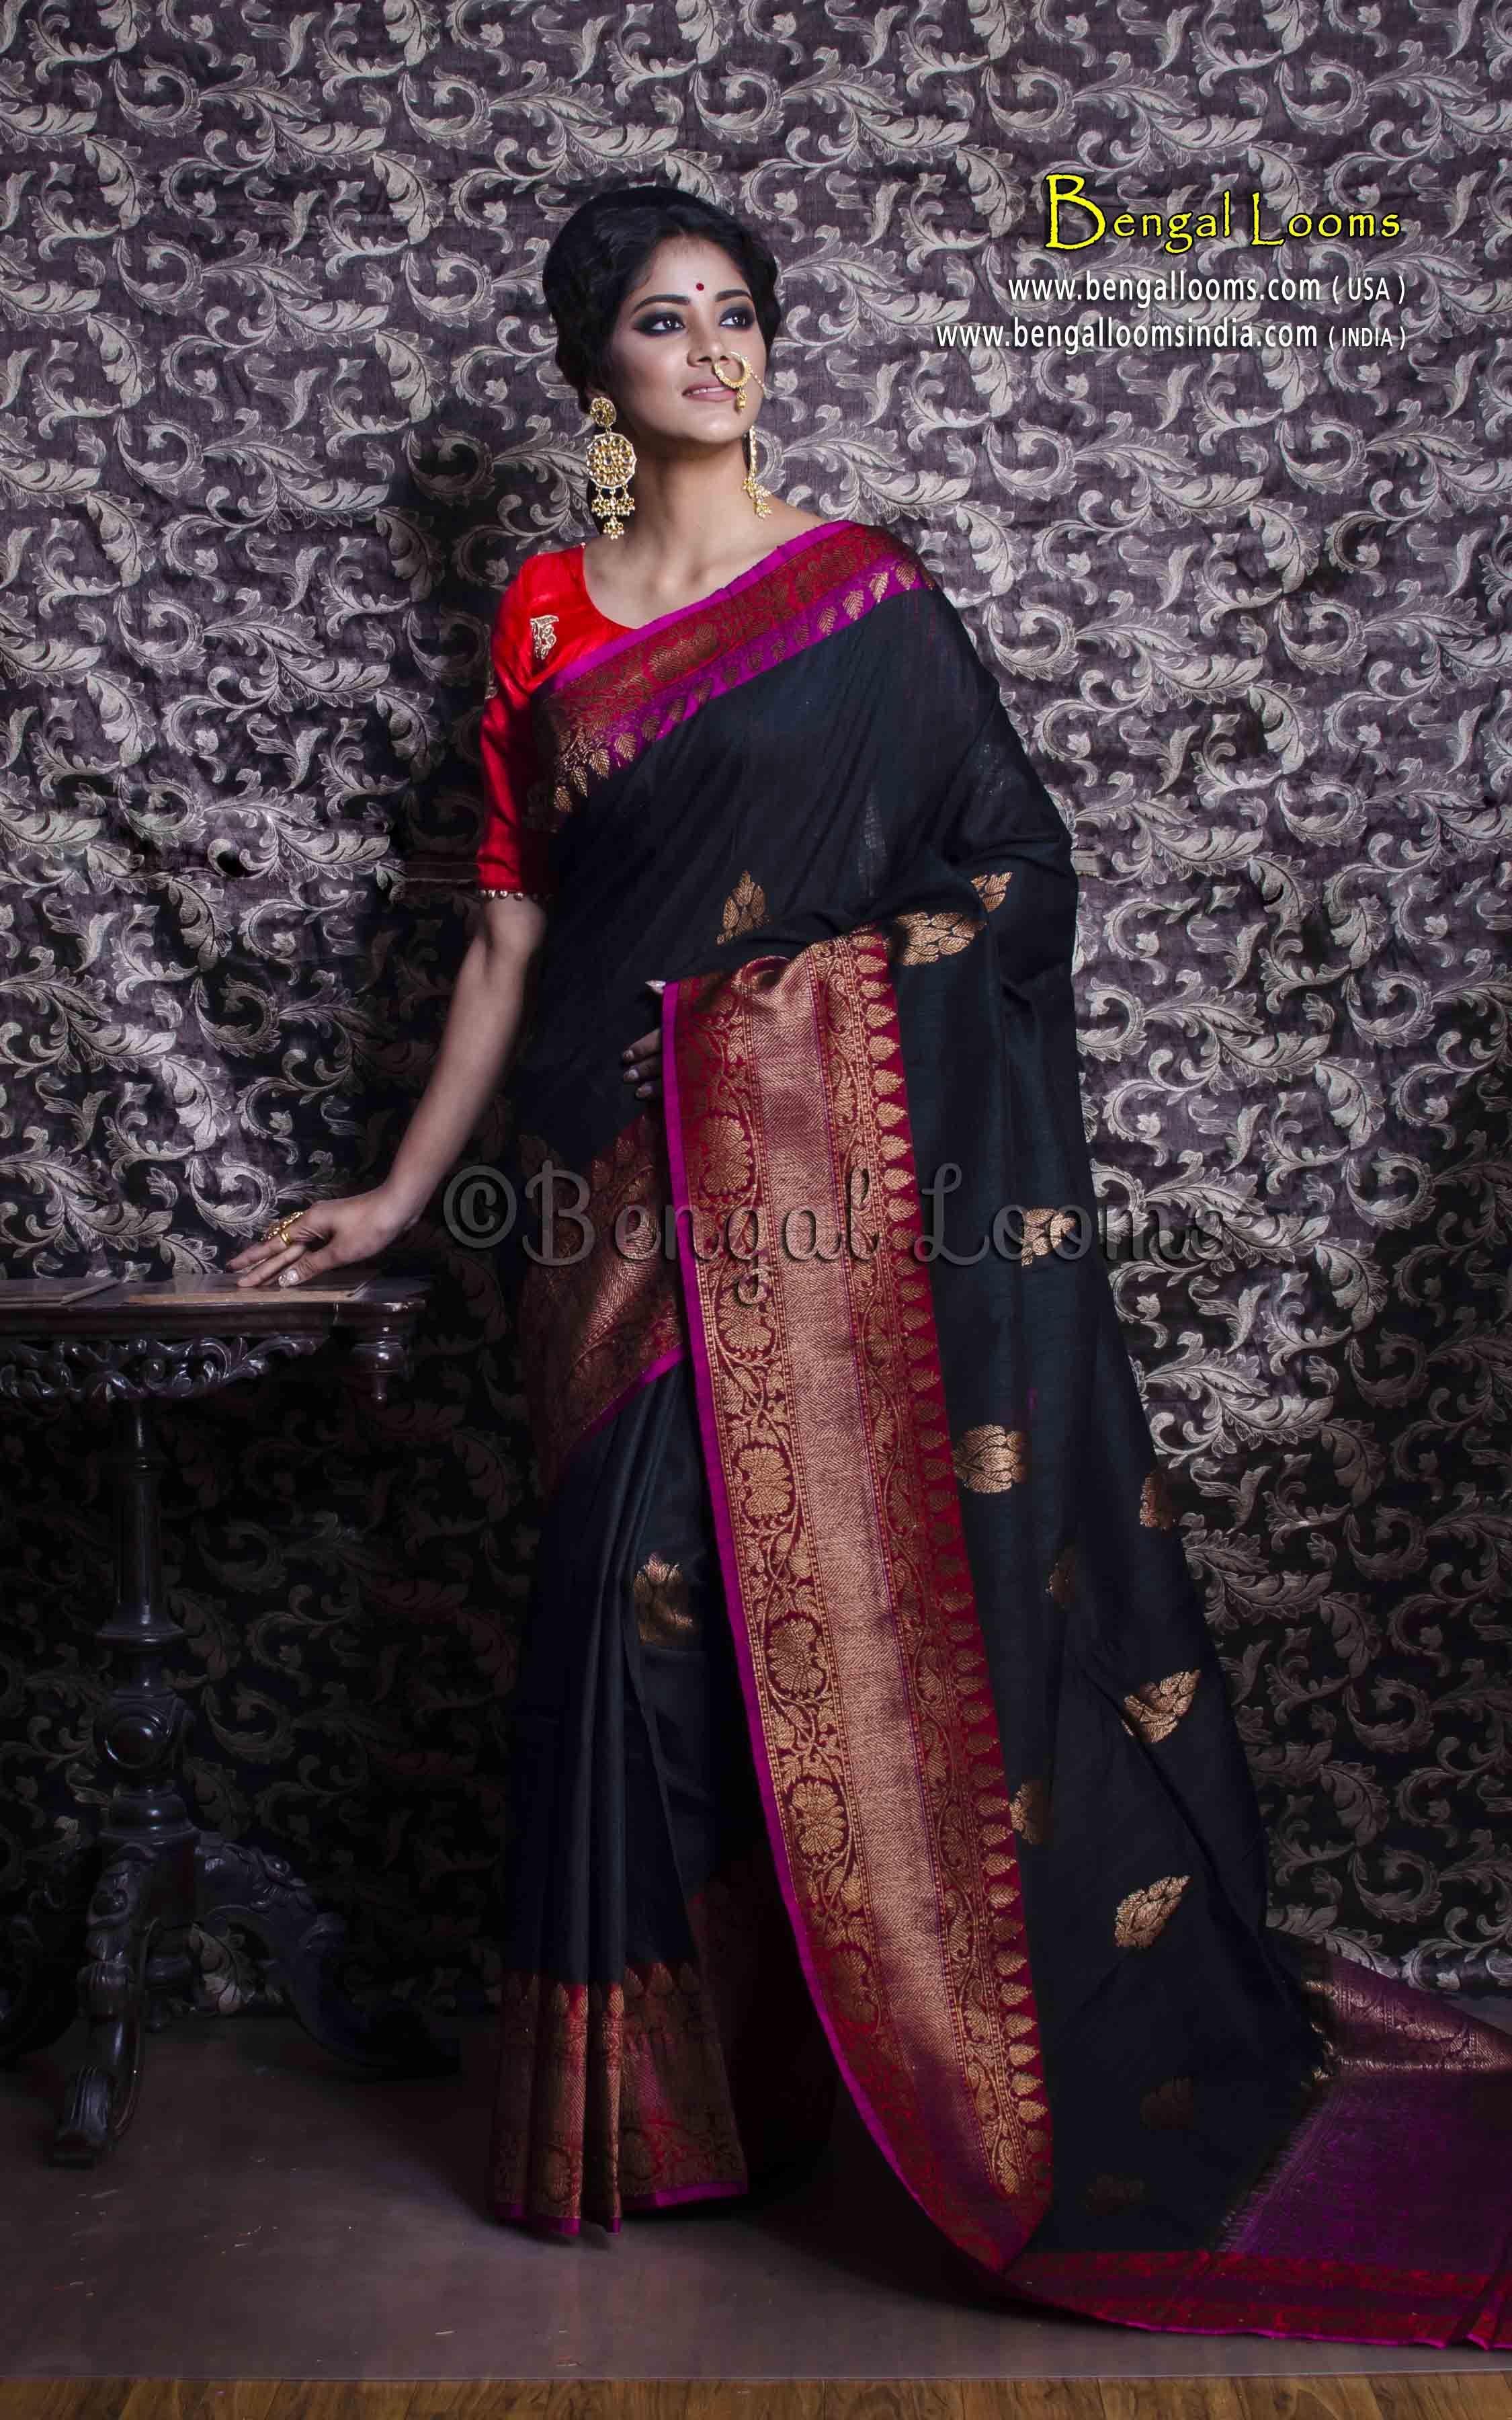 fee80bcd28 Pure Handloom Tussar Silk Banarasi Saree in Black, Maroon and Antique Zari